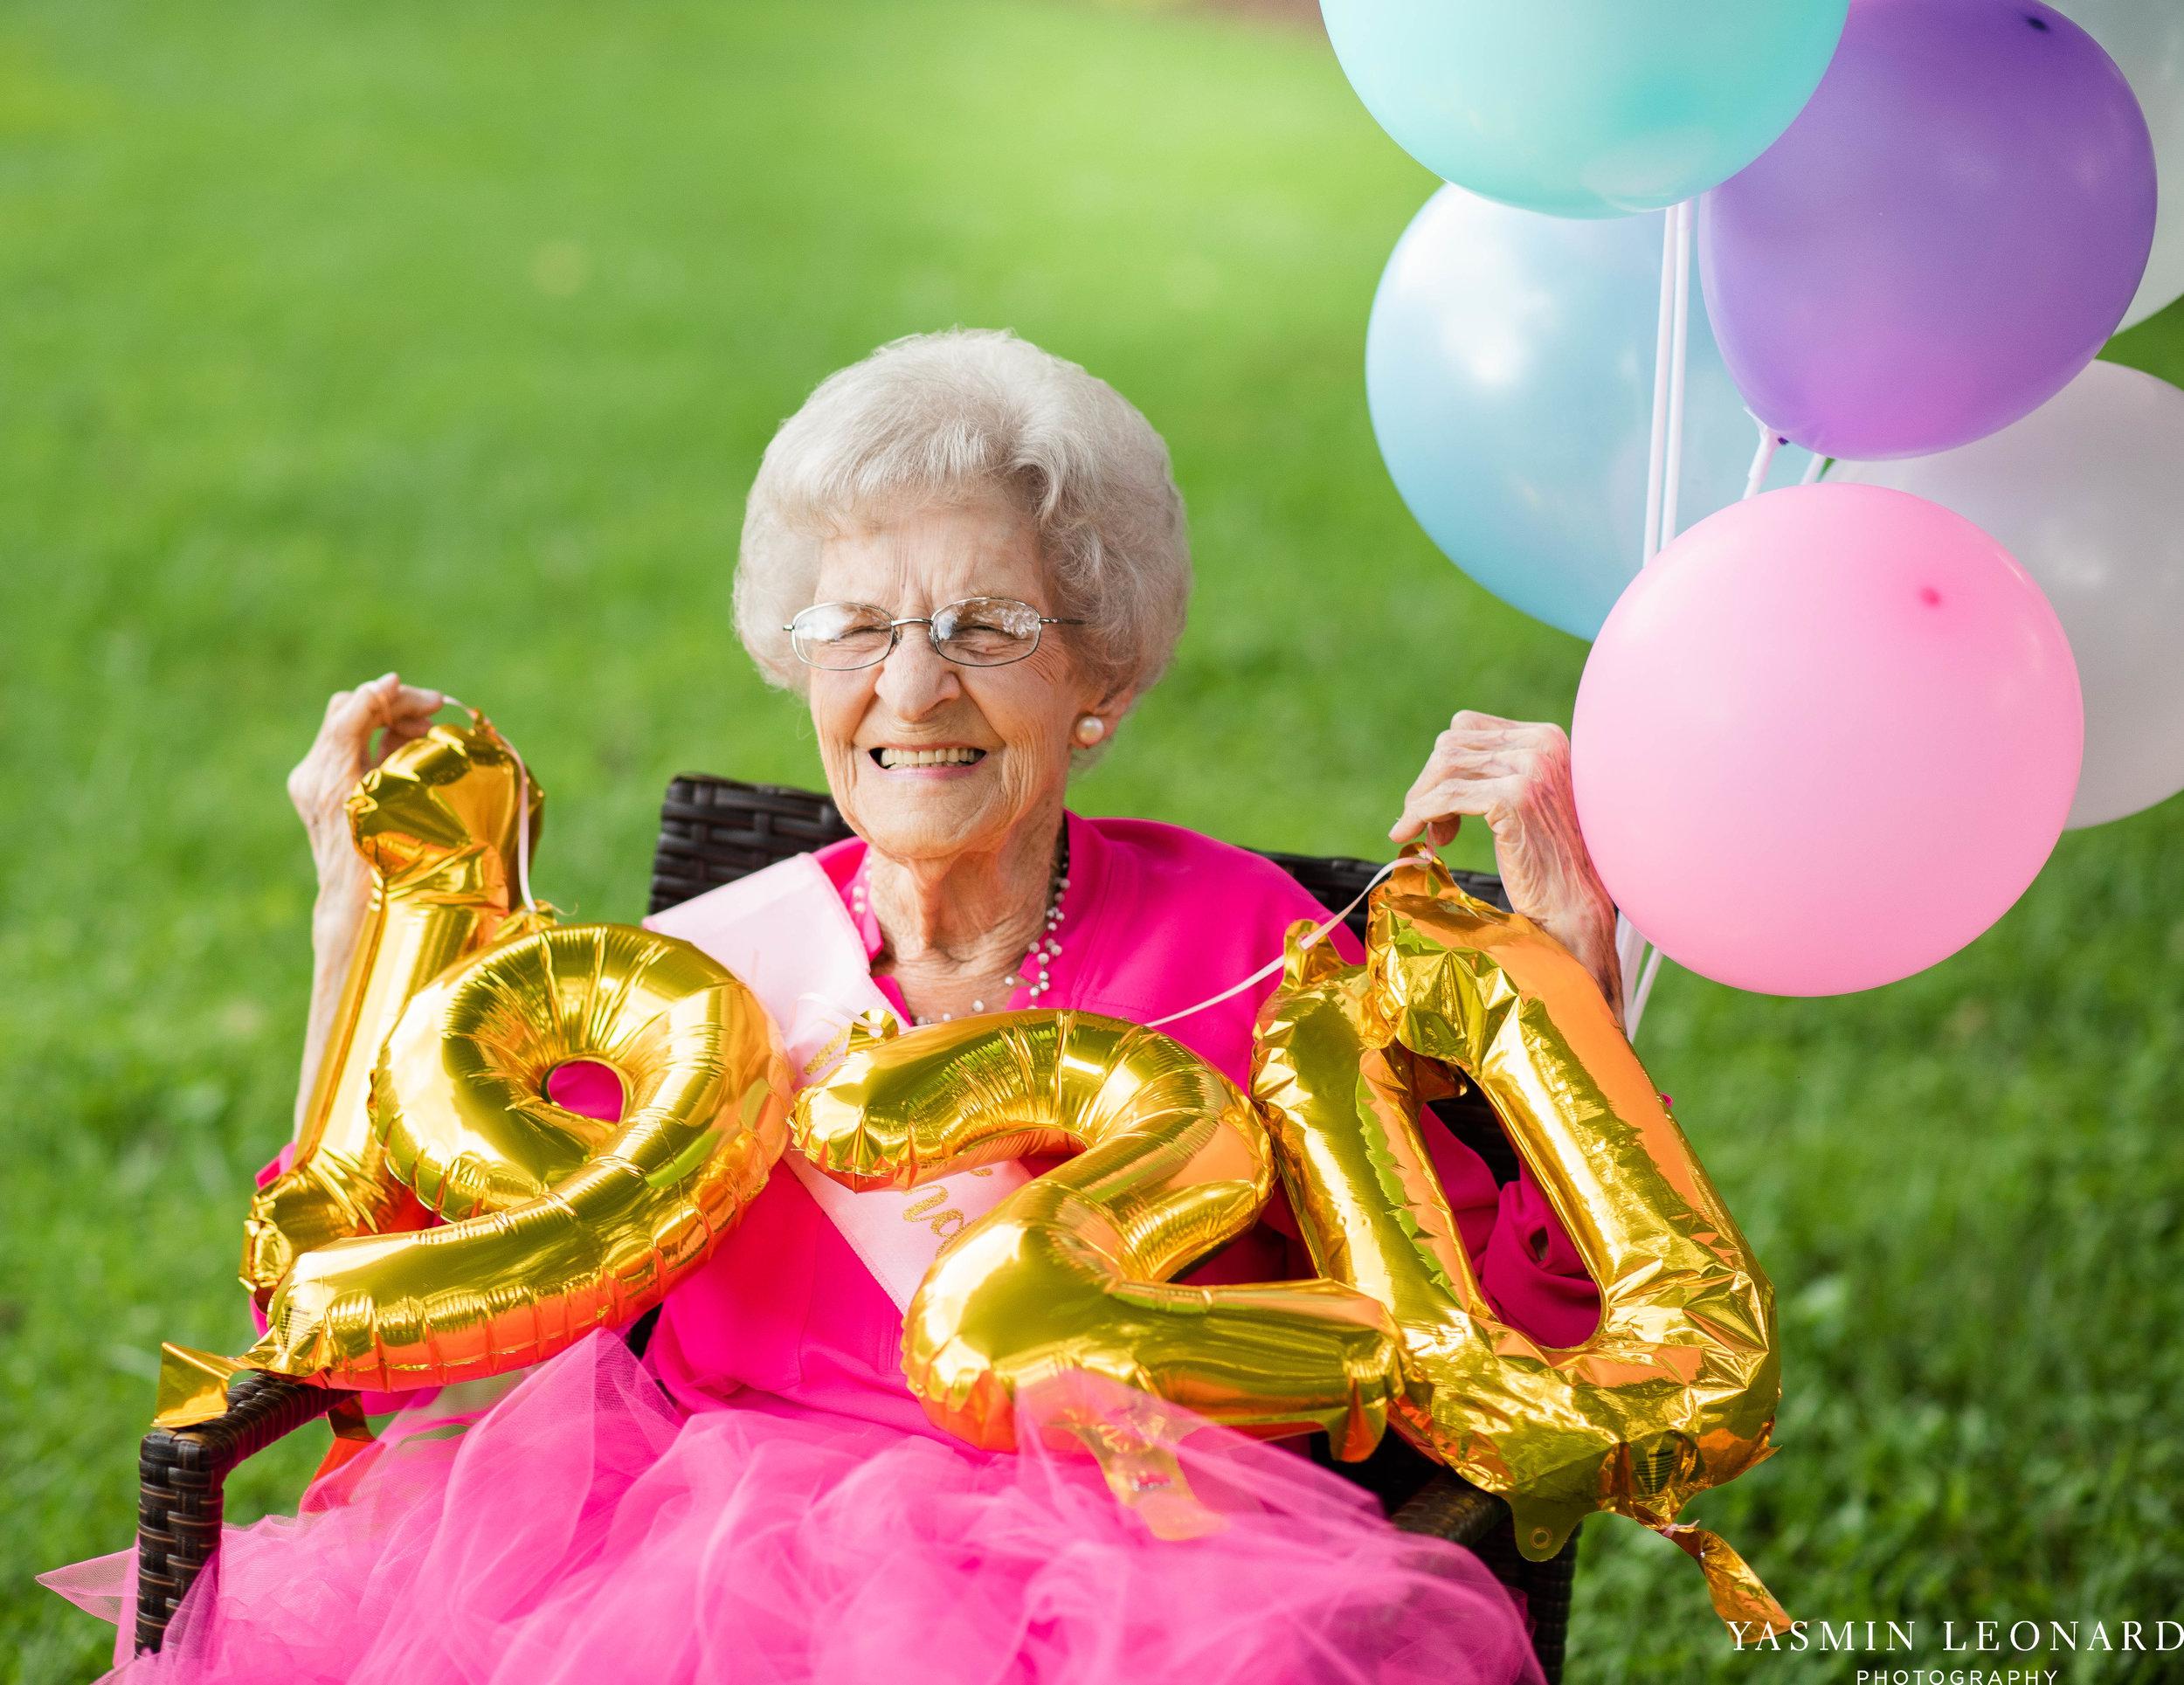 99 Year Old Birthday - Great Grandma Birthday Session - Grandma Birthday Session - 99 years Old - Adult Birthday Session - Four Generations-1.jpg